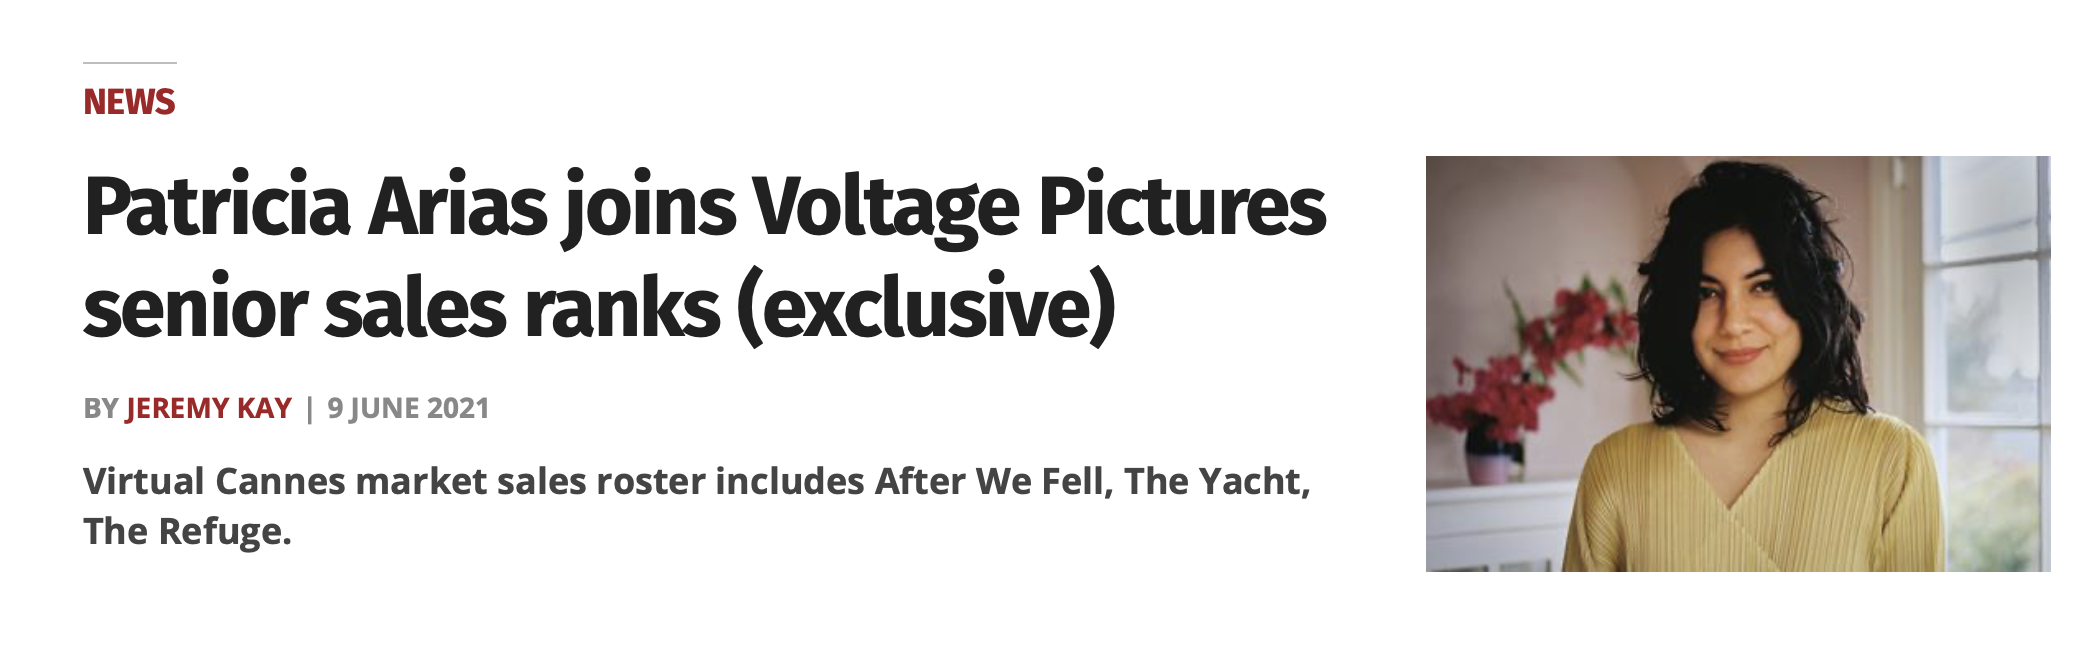 Patricia Arias joins Voltage Pictures senior sales ranks (exclusive)